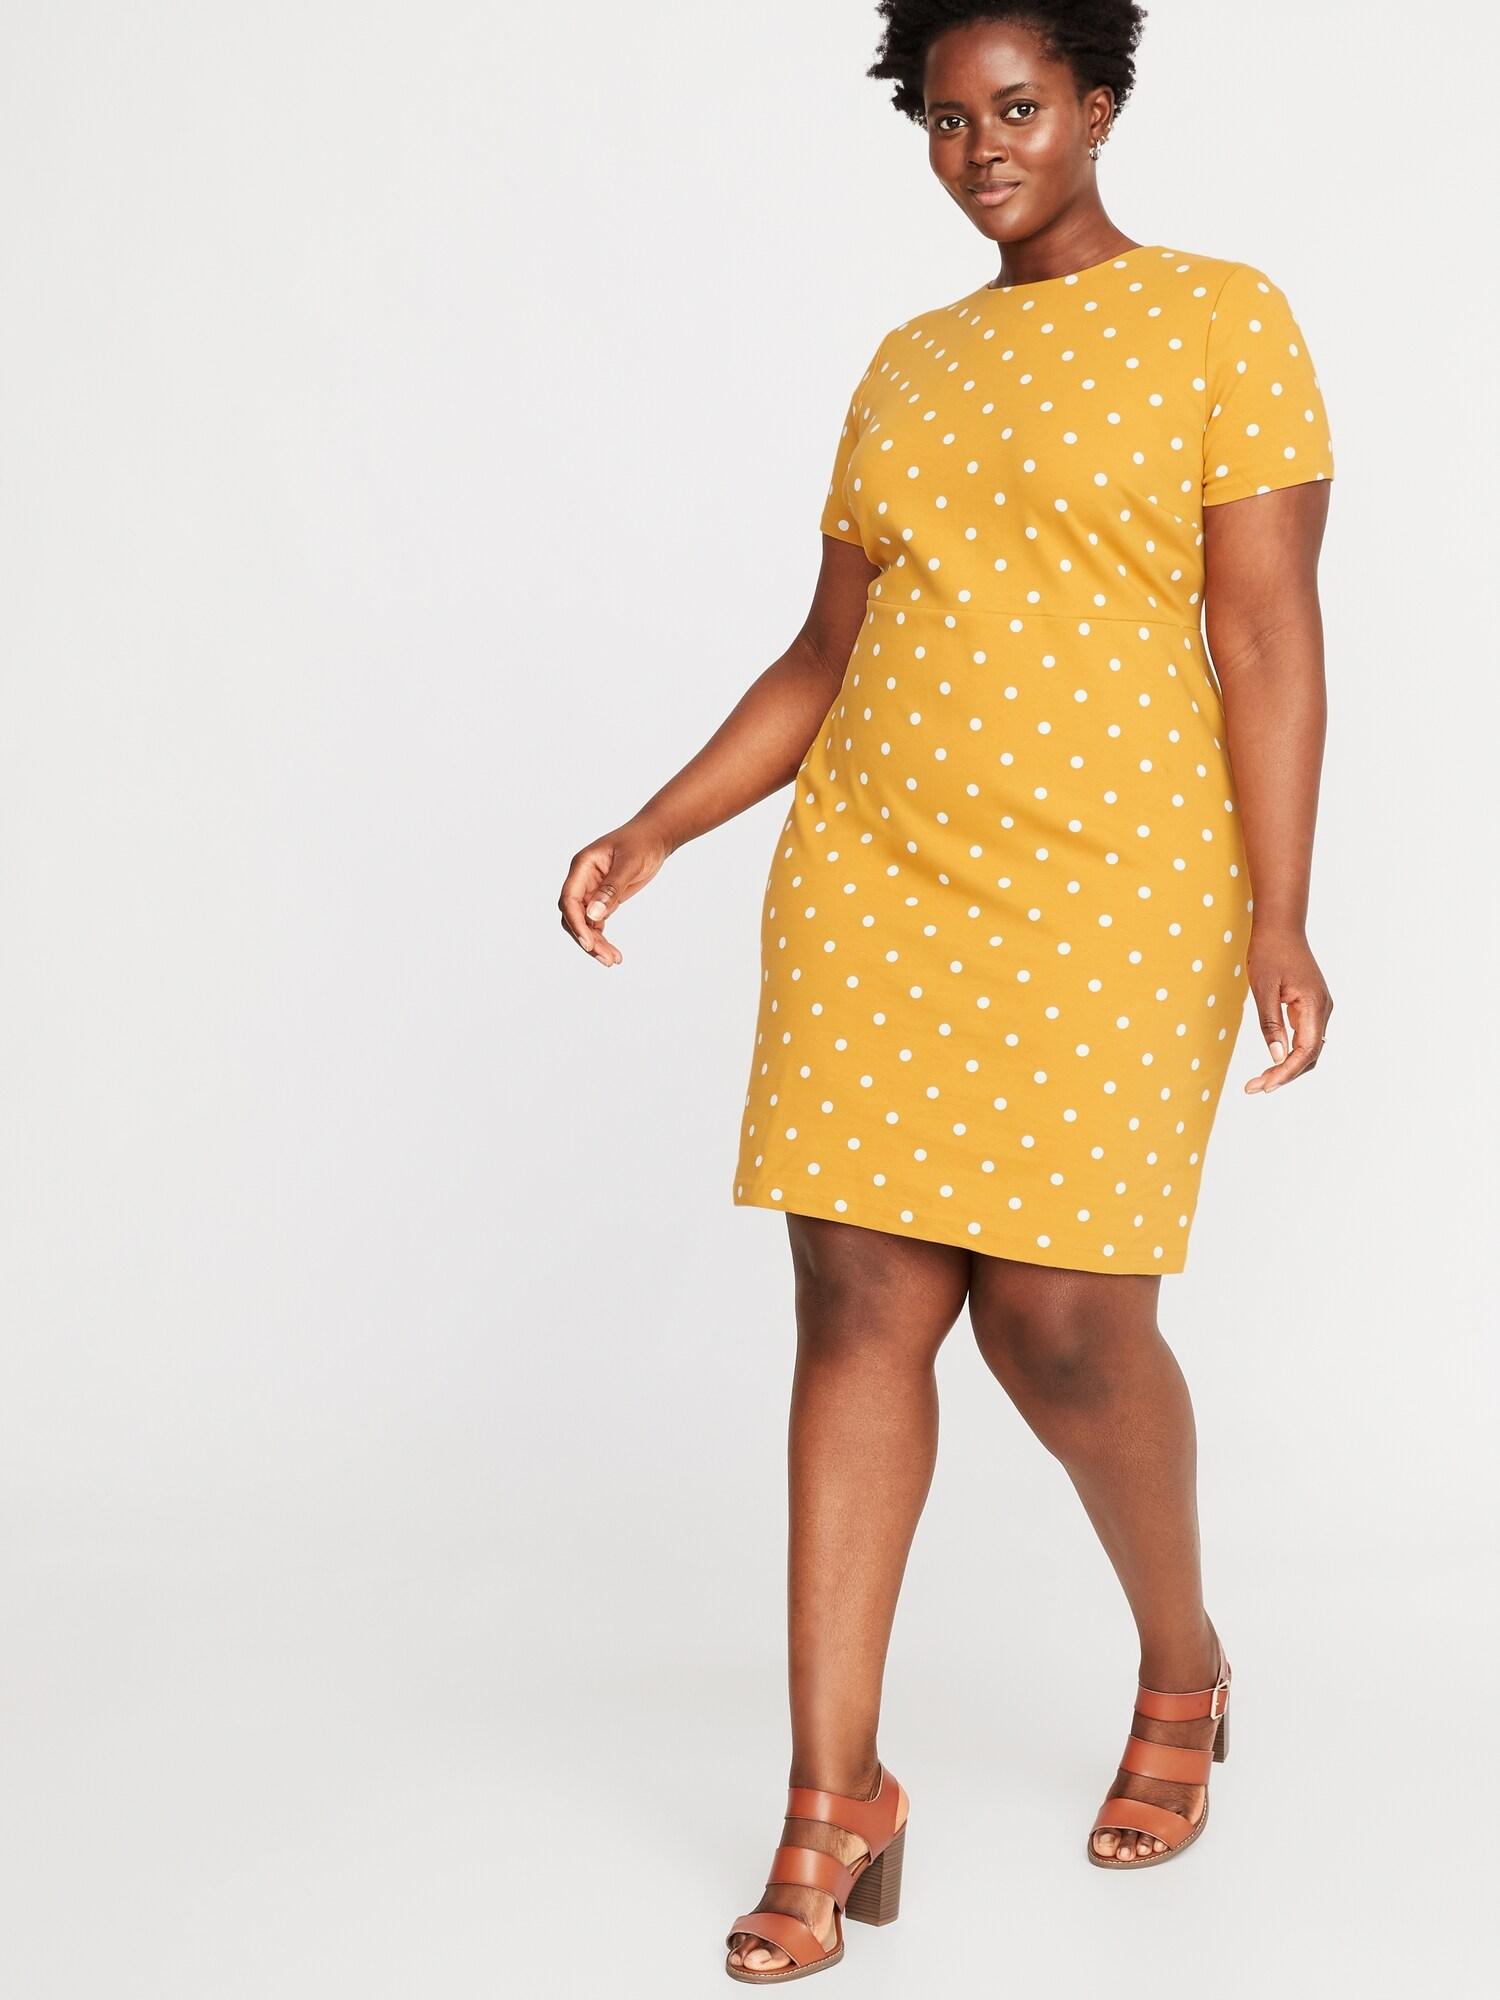 Printed Ponte-Knit Plus-Size Sheath Dress | Old Navy